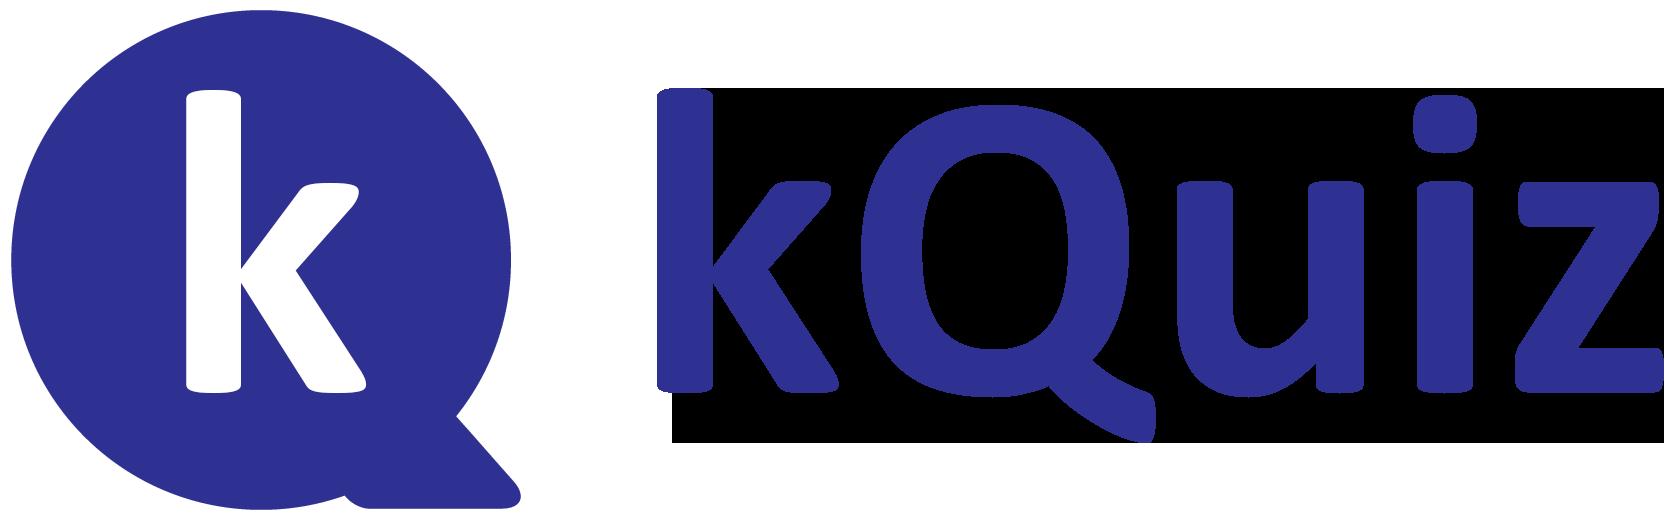 kQuiz Logo